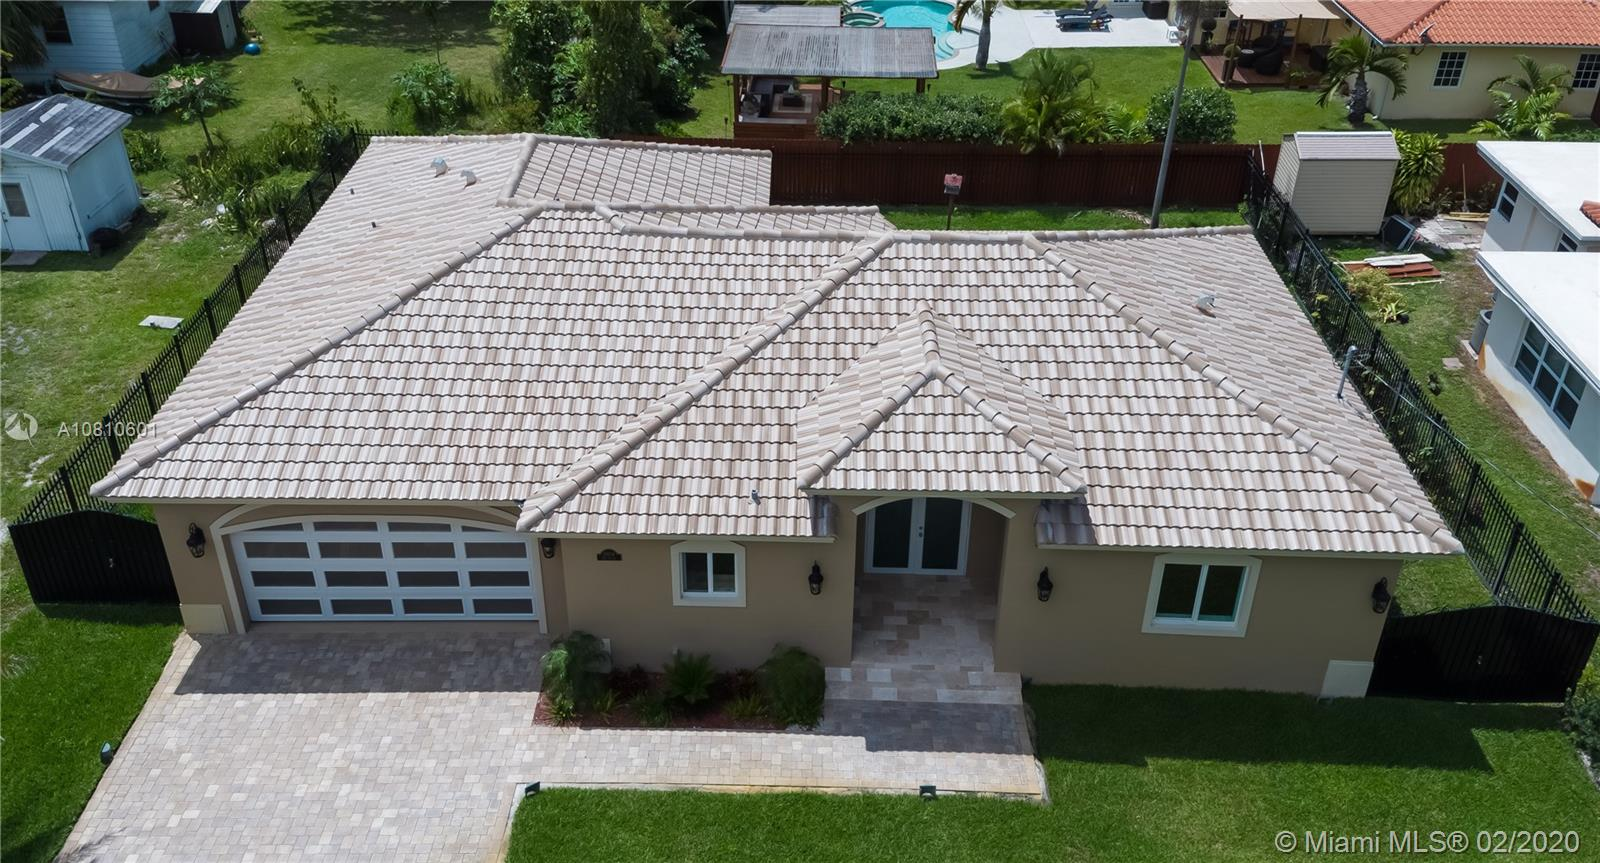 11804 NE 11th Ave Property Photo - Biscayne Park, FL real estate listing